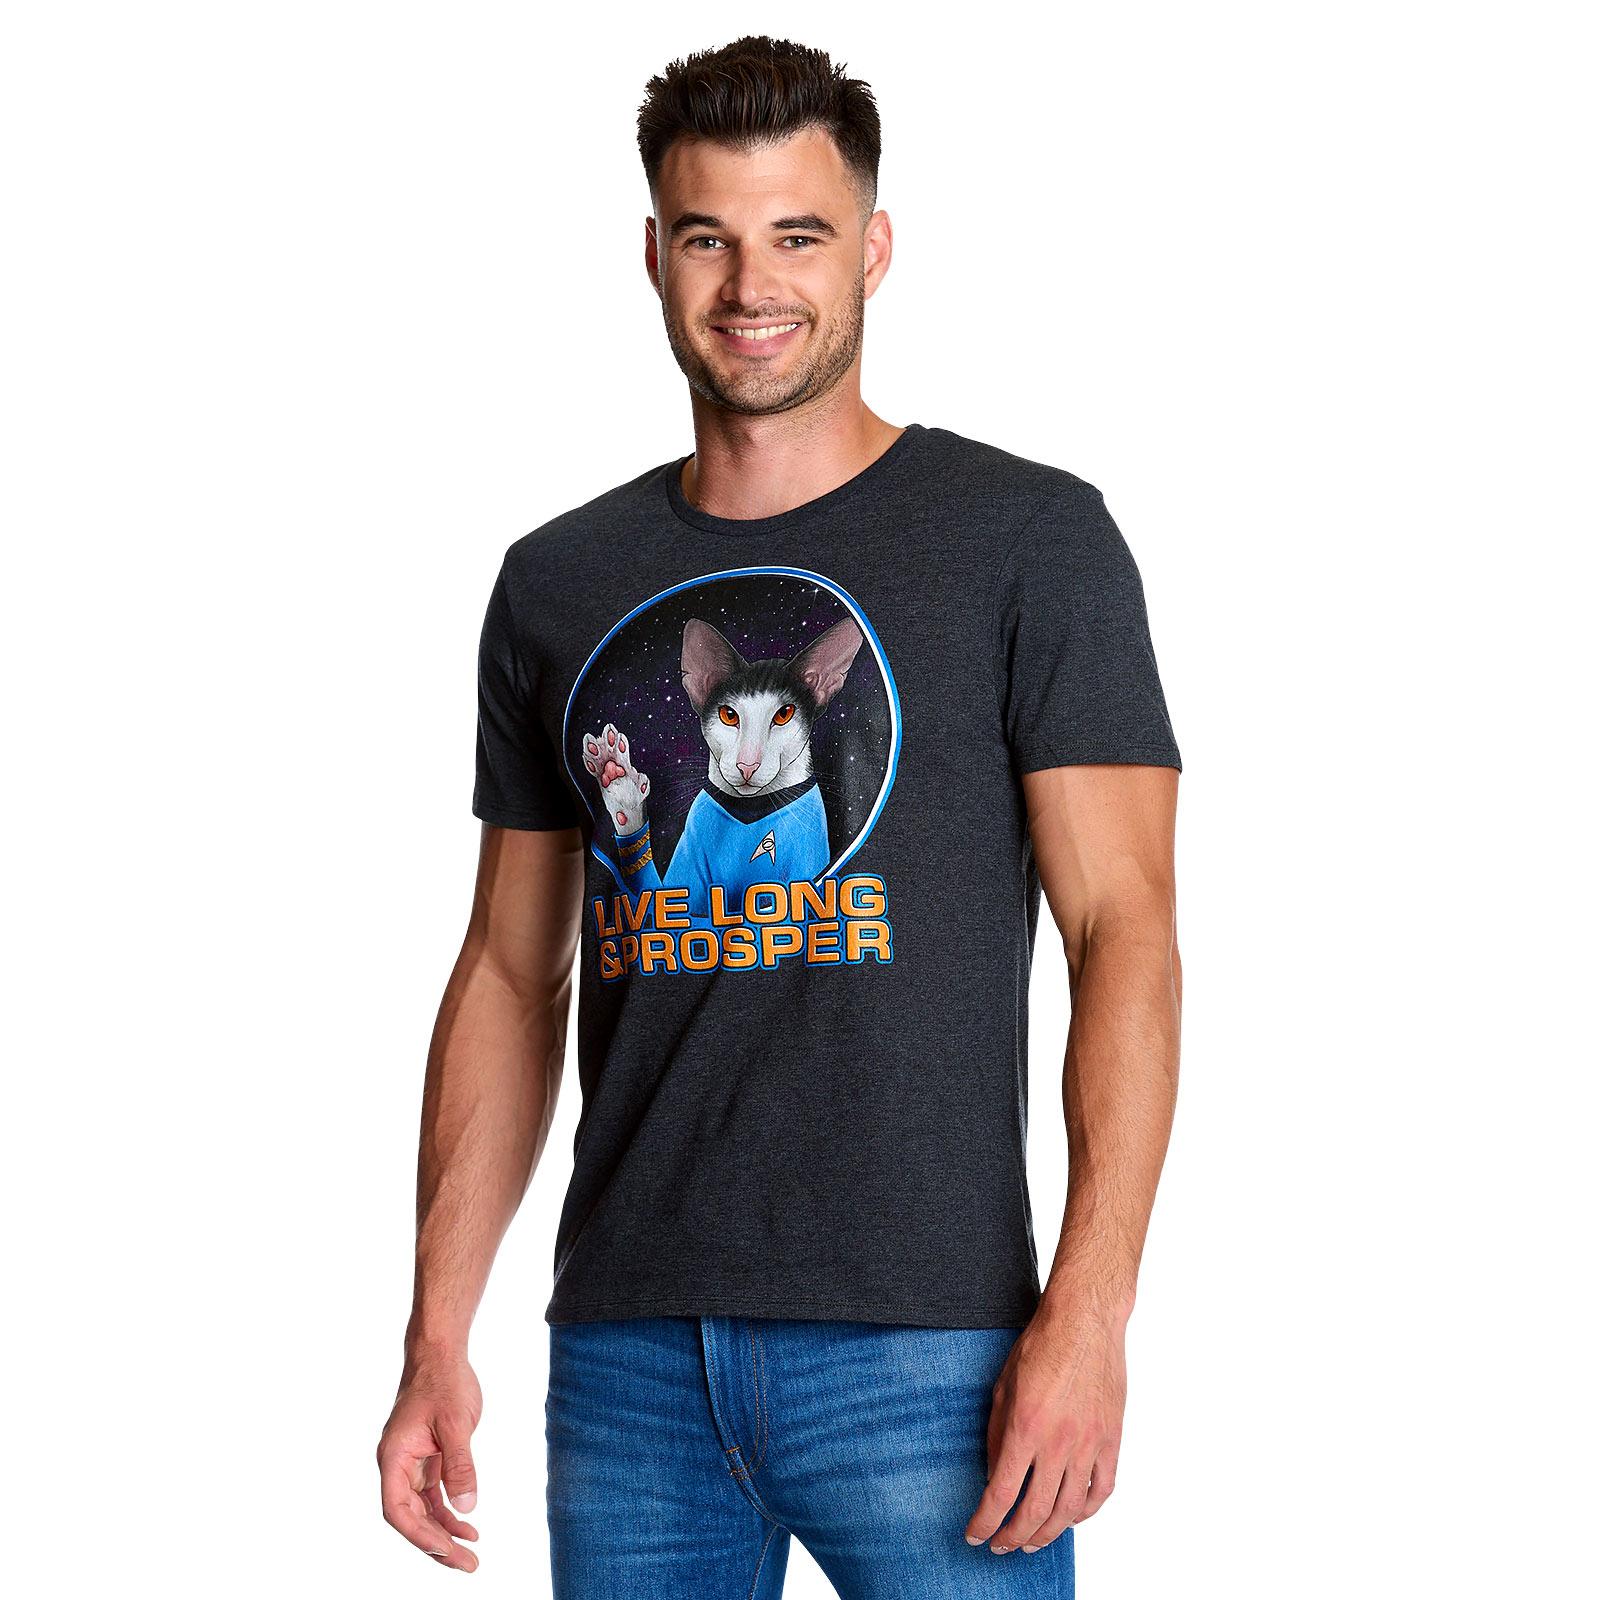 Star Trek - Cat Spock Live Long and Prosper T-Shirt grau